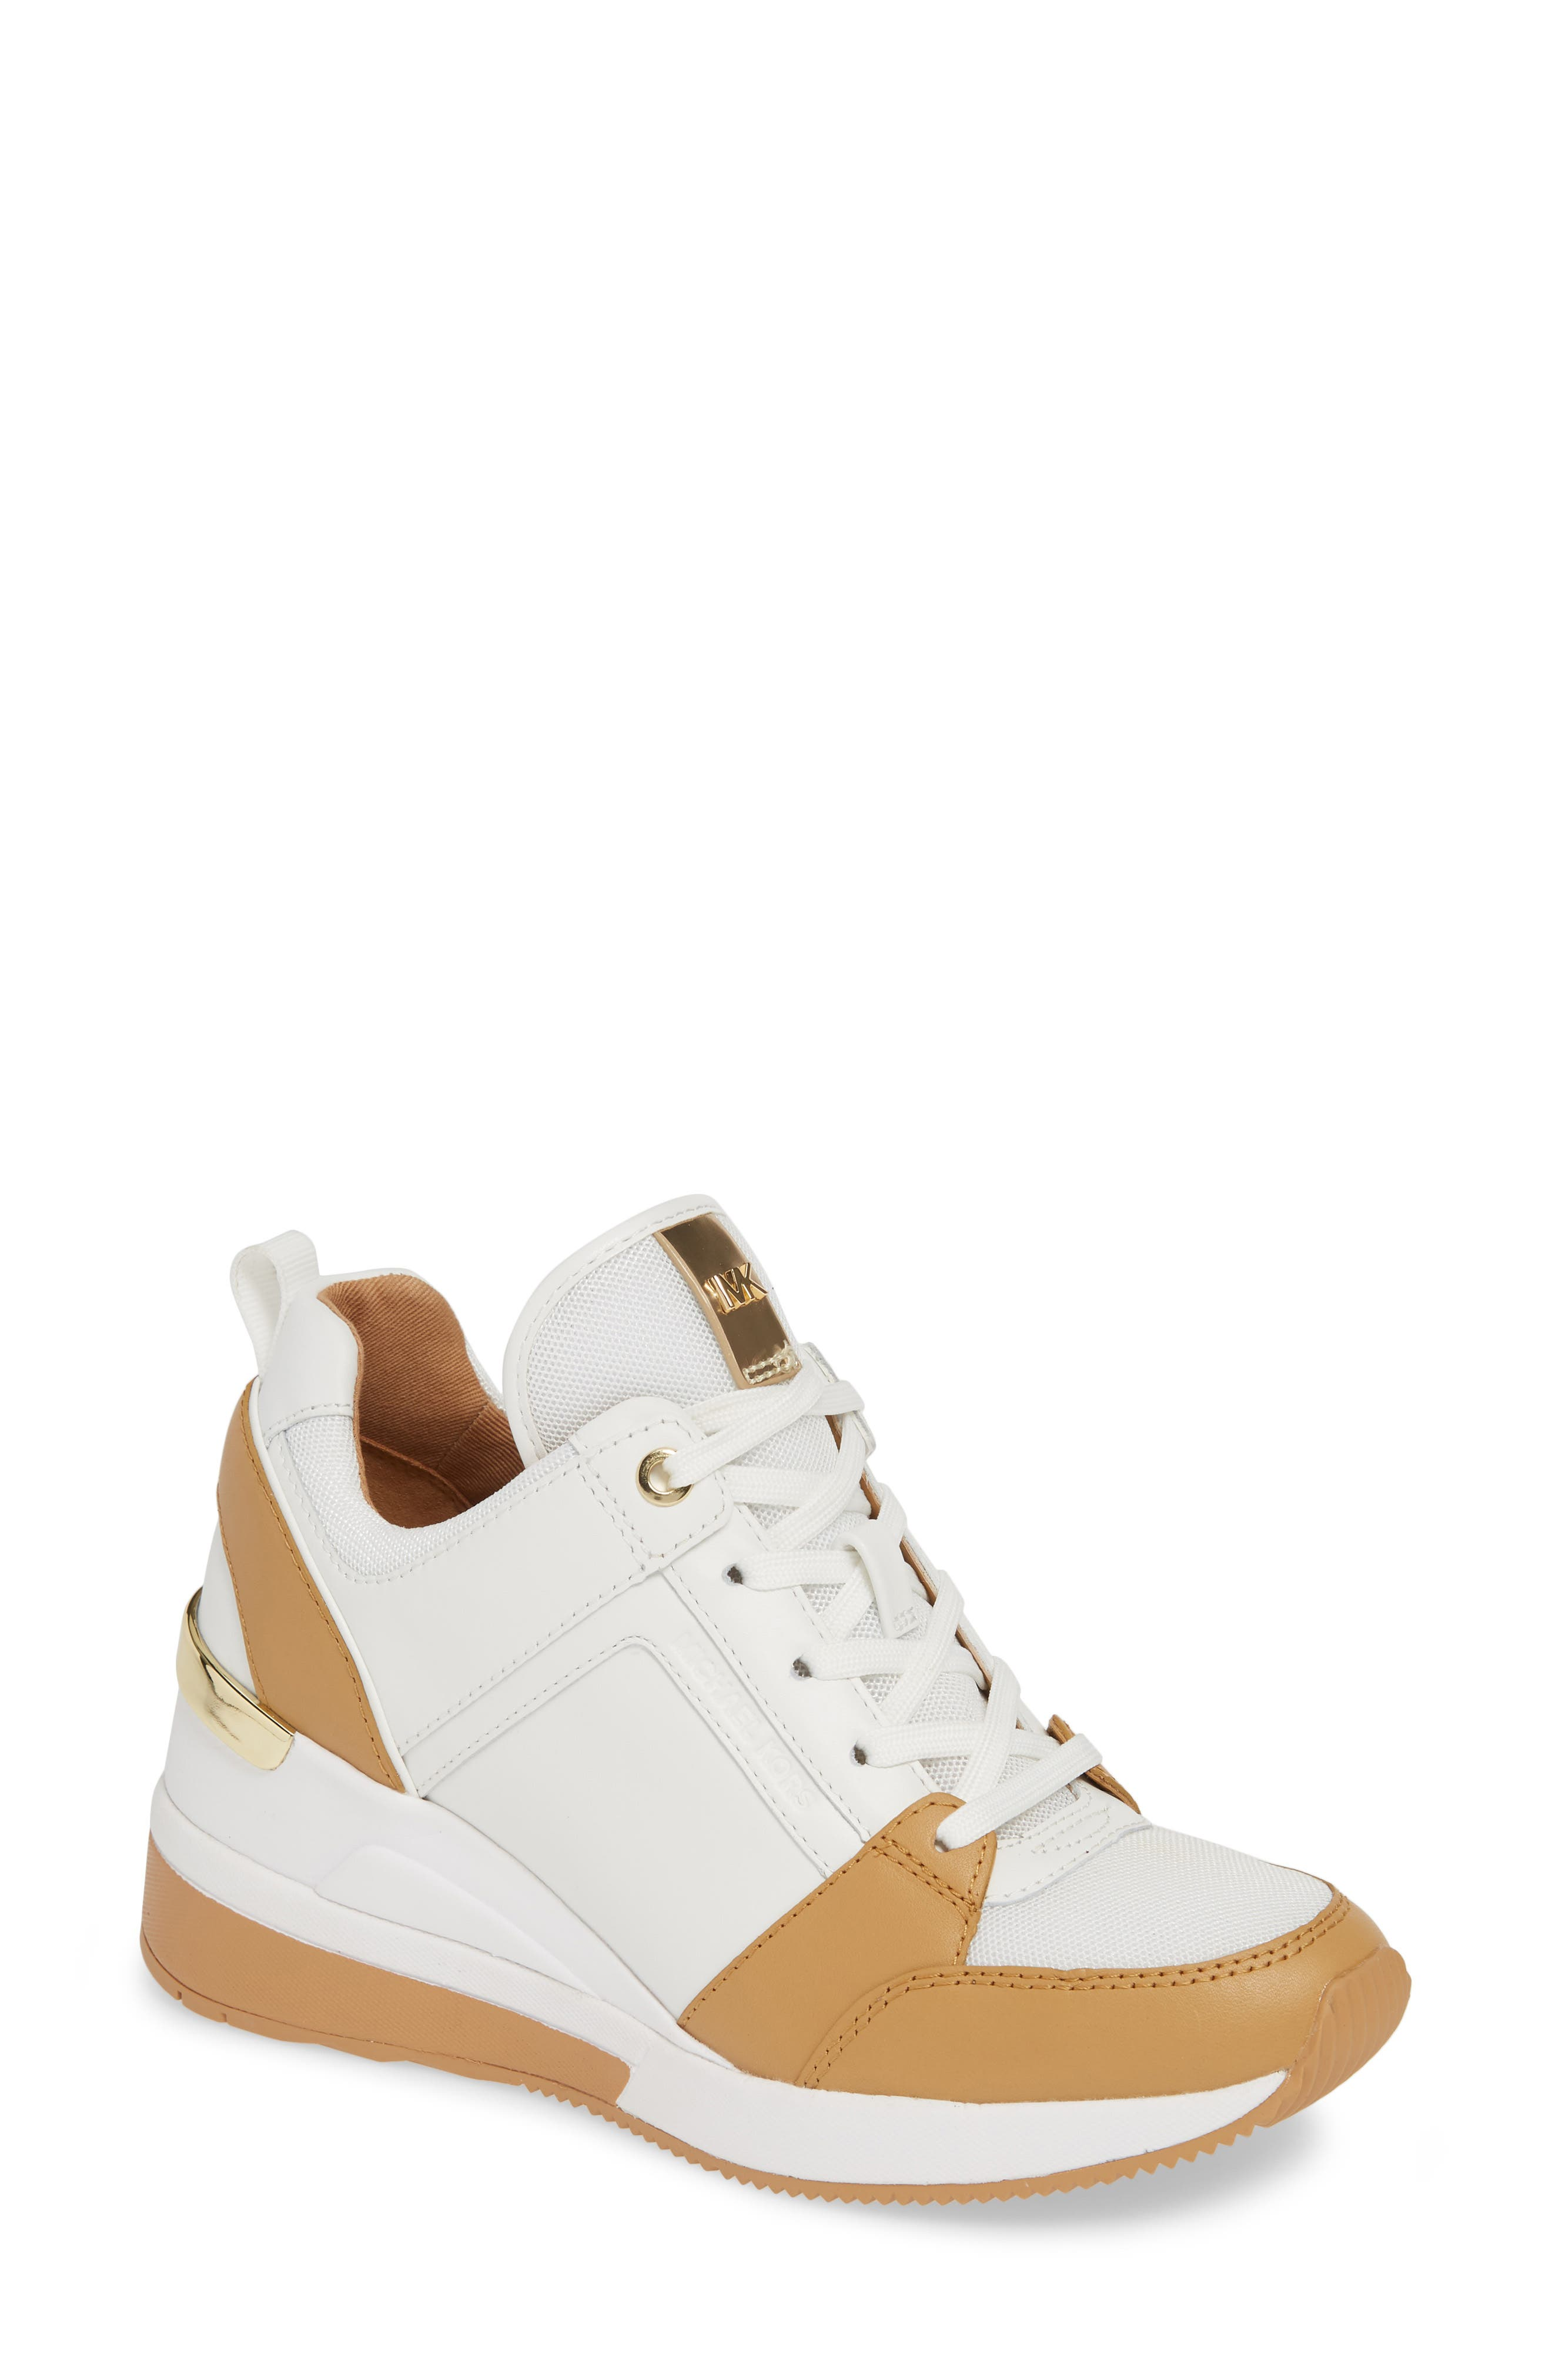 MICHAEL MICHAEL KORS,                             Georgie Wedge Sneaker,                             Main thumbnail 1, color,                             OPTIC WHITE MULTI